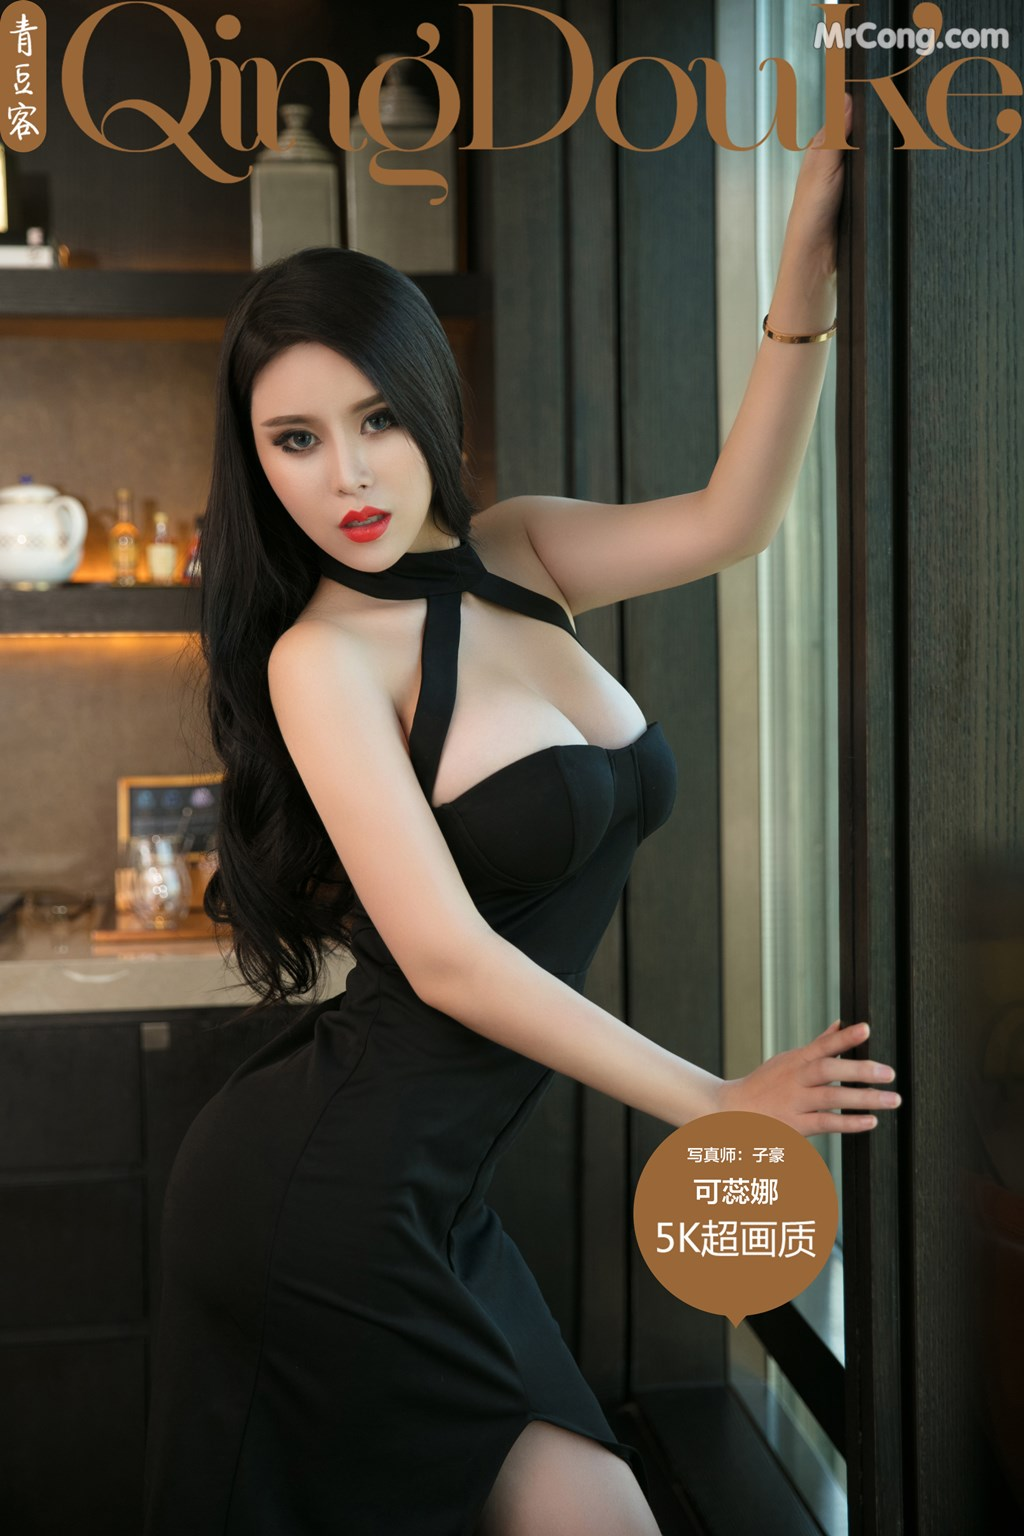 Image QingDouKe-2017-11-05-Ke-Rui-Na-MrCong.com-048 in post QingDouKe 2017-11-05: Người mẫu Ke Rui Na (可蕊娜) (48 ảnh)